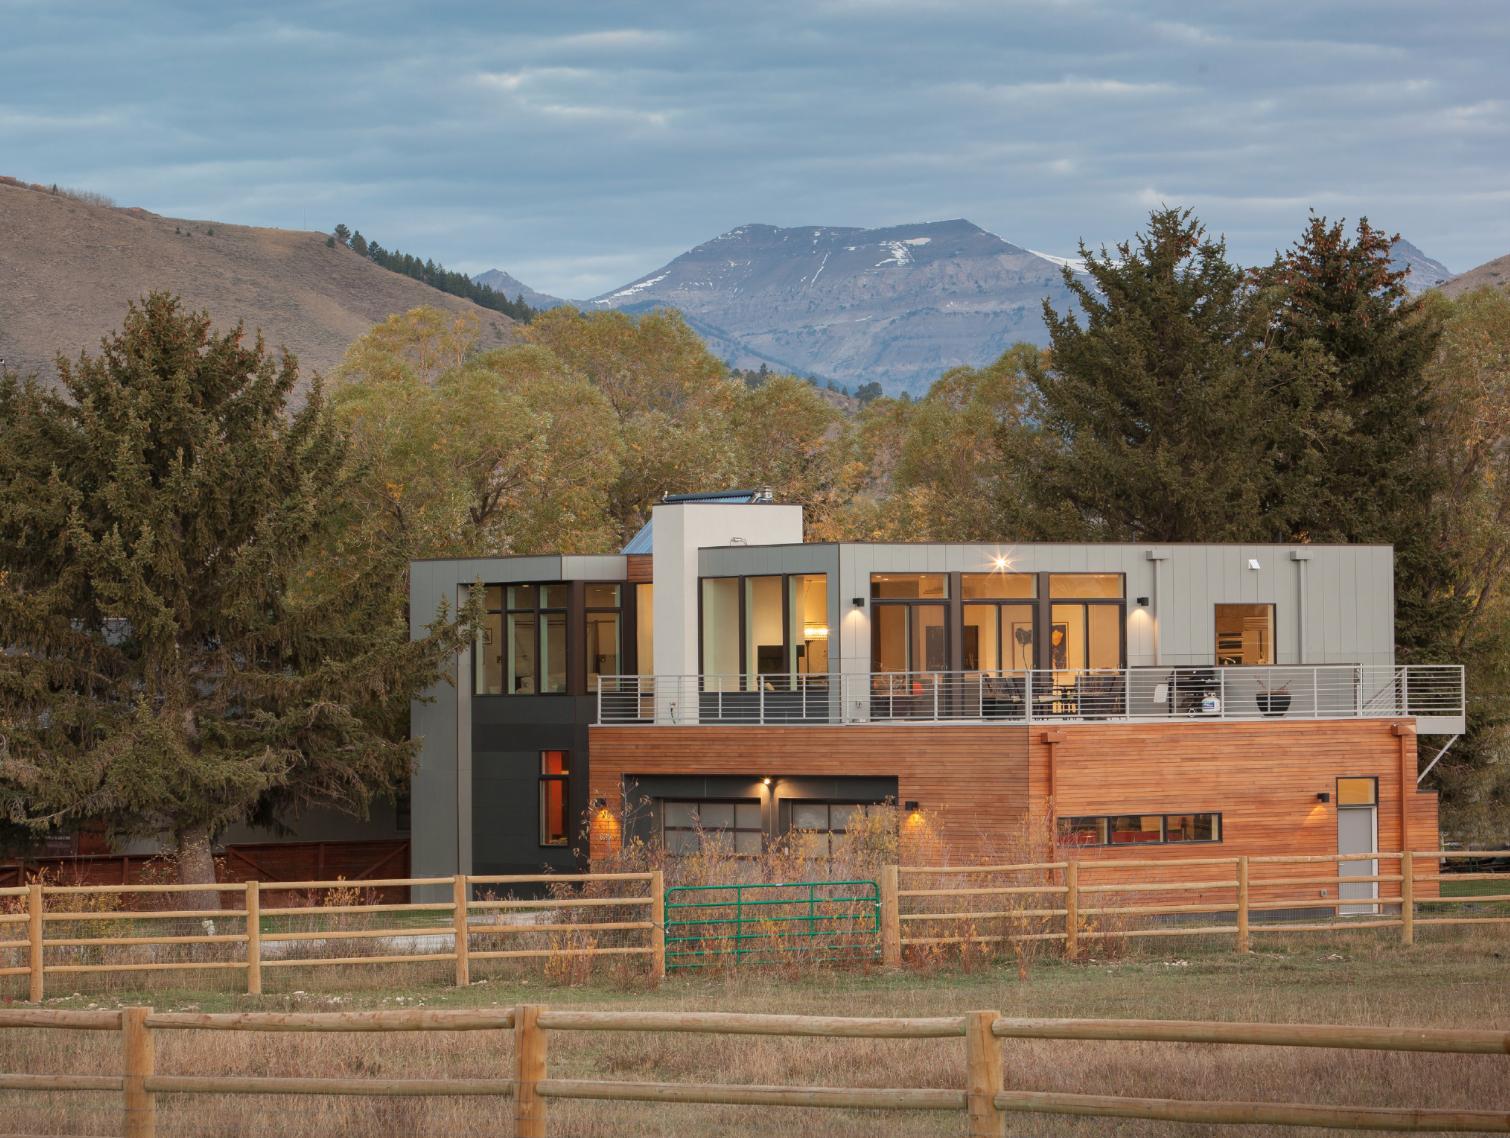 Photo Credit: Sun Valley Photo // Architect: Chris Pardo Design // Builder: Methodf